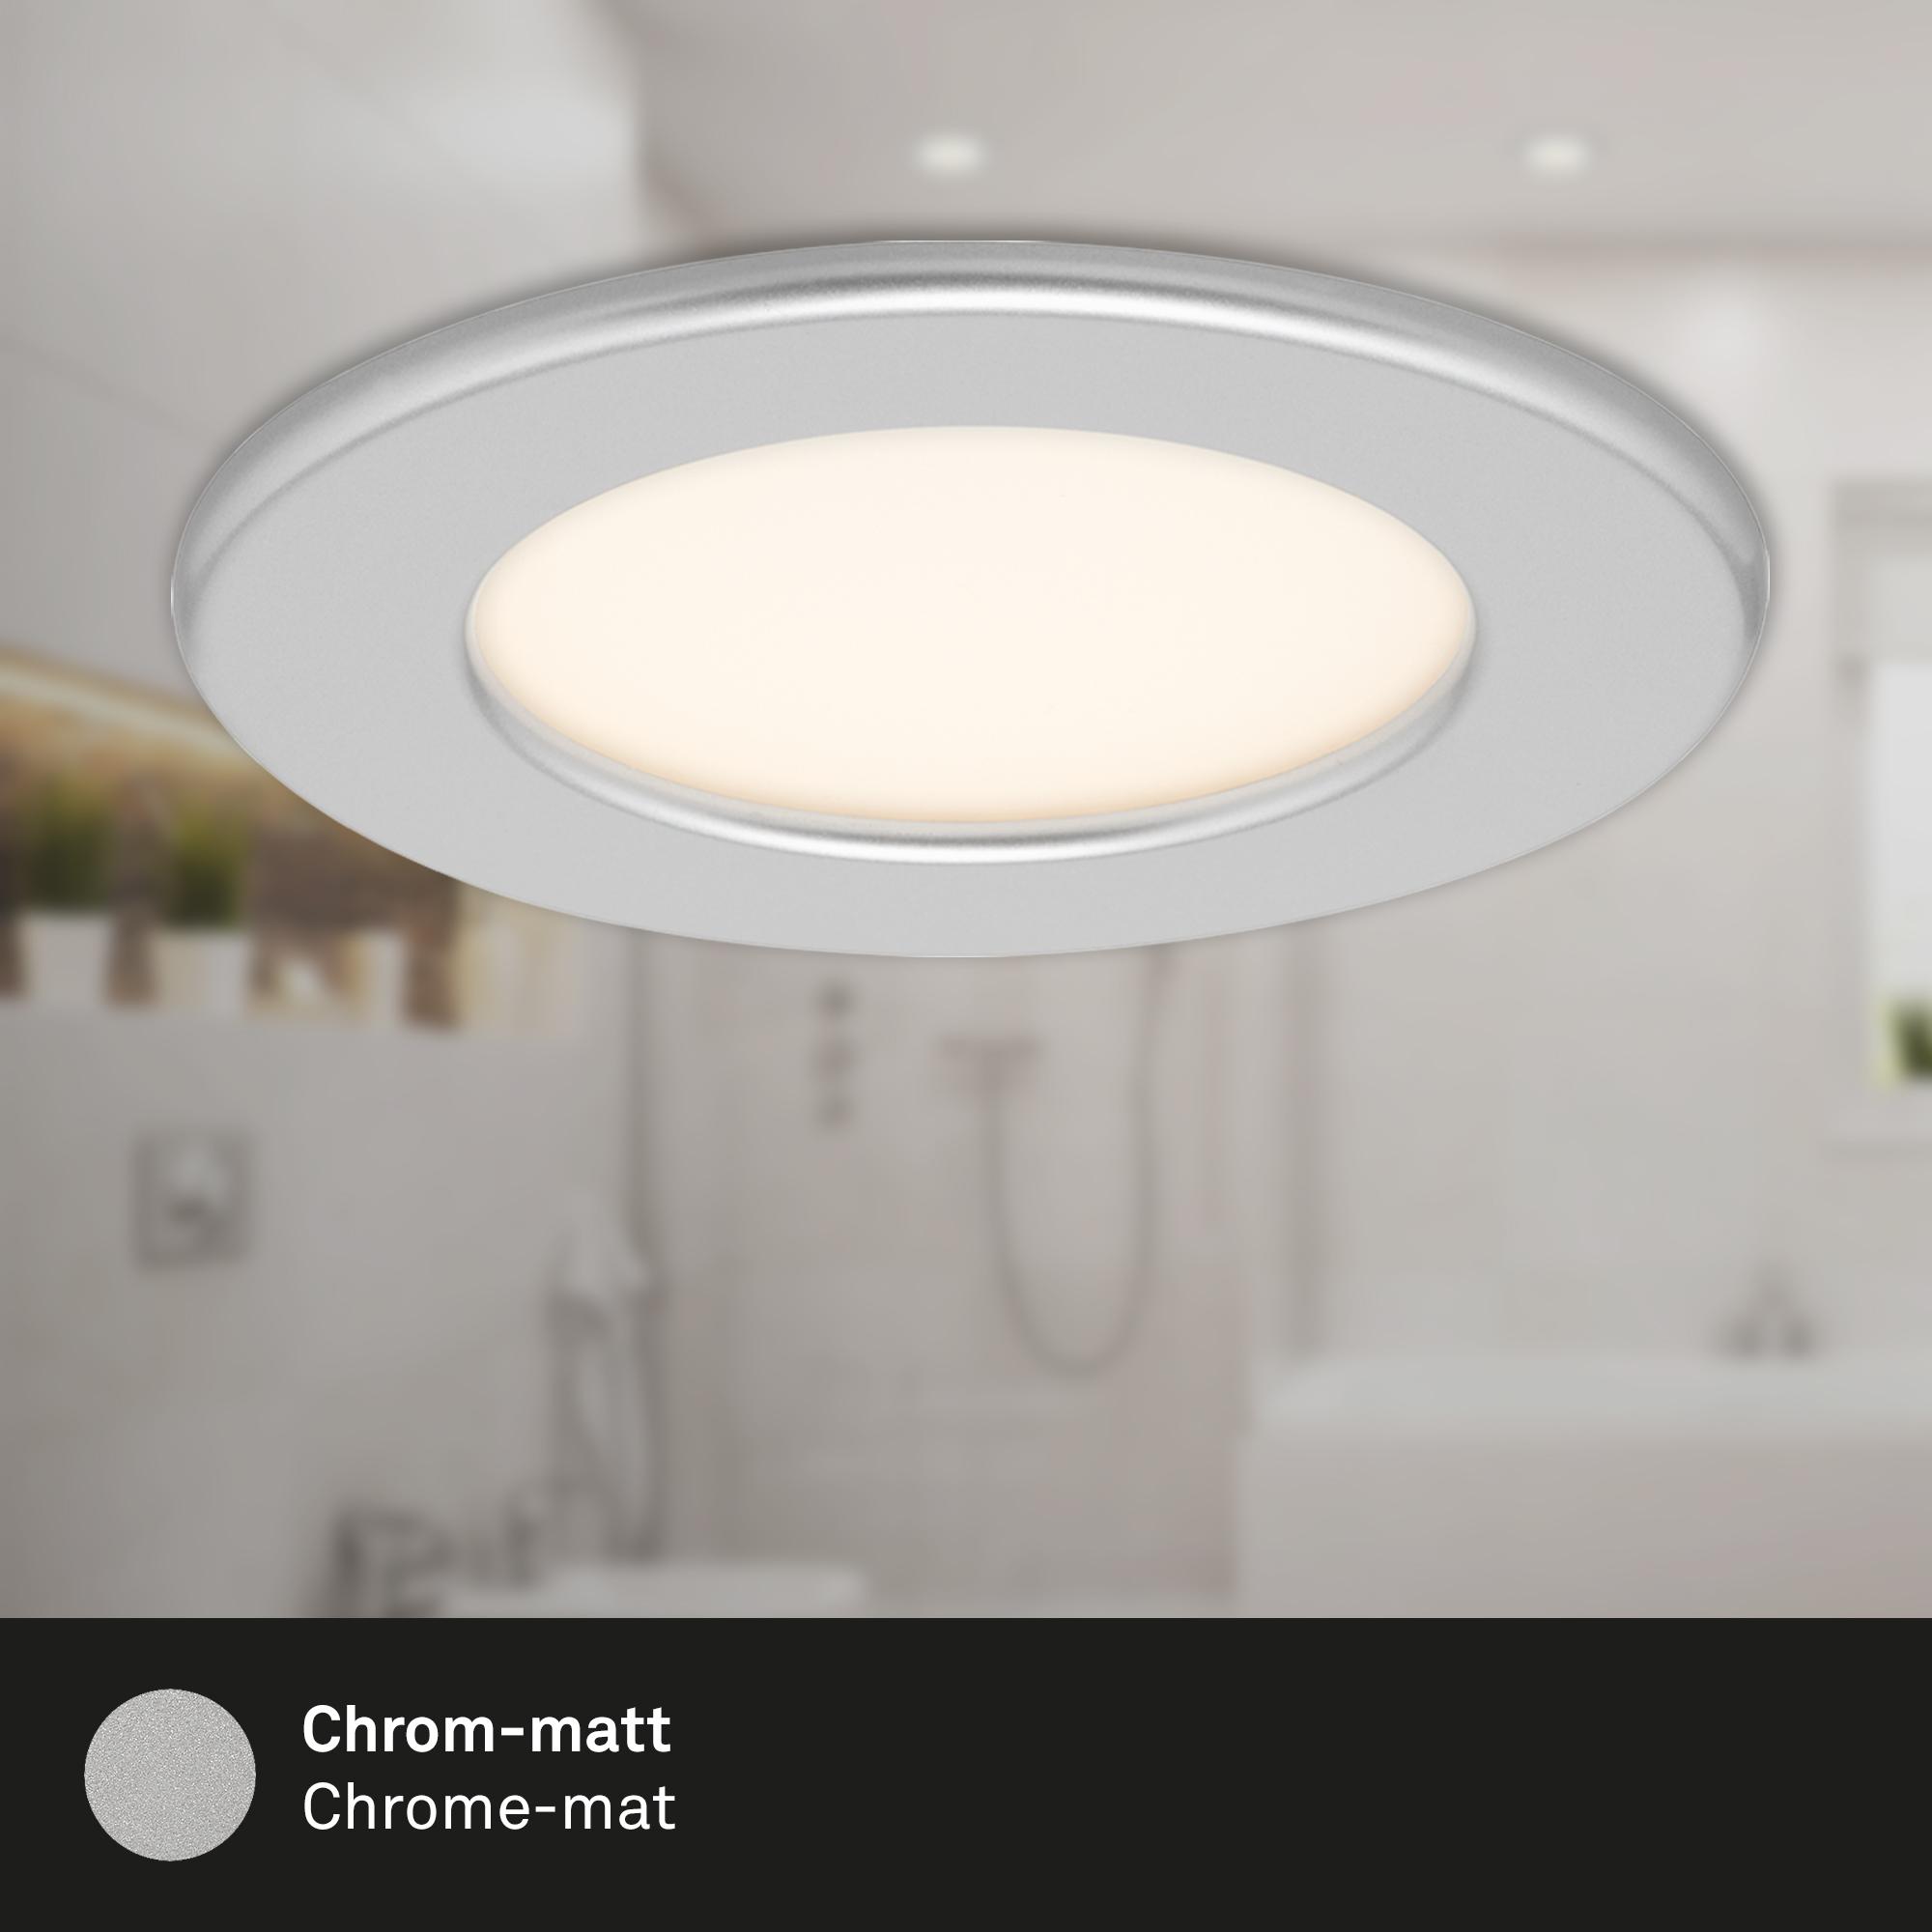 LED Einbauleuchte, Ø 11,5 cm, 6 W, Chrom-Matt